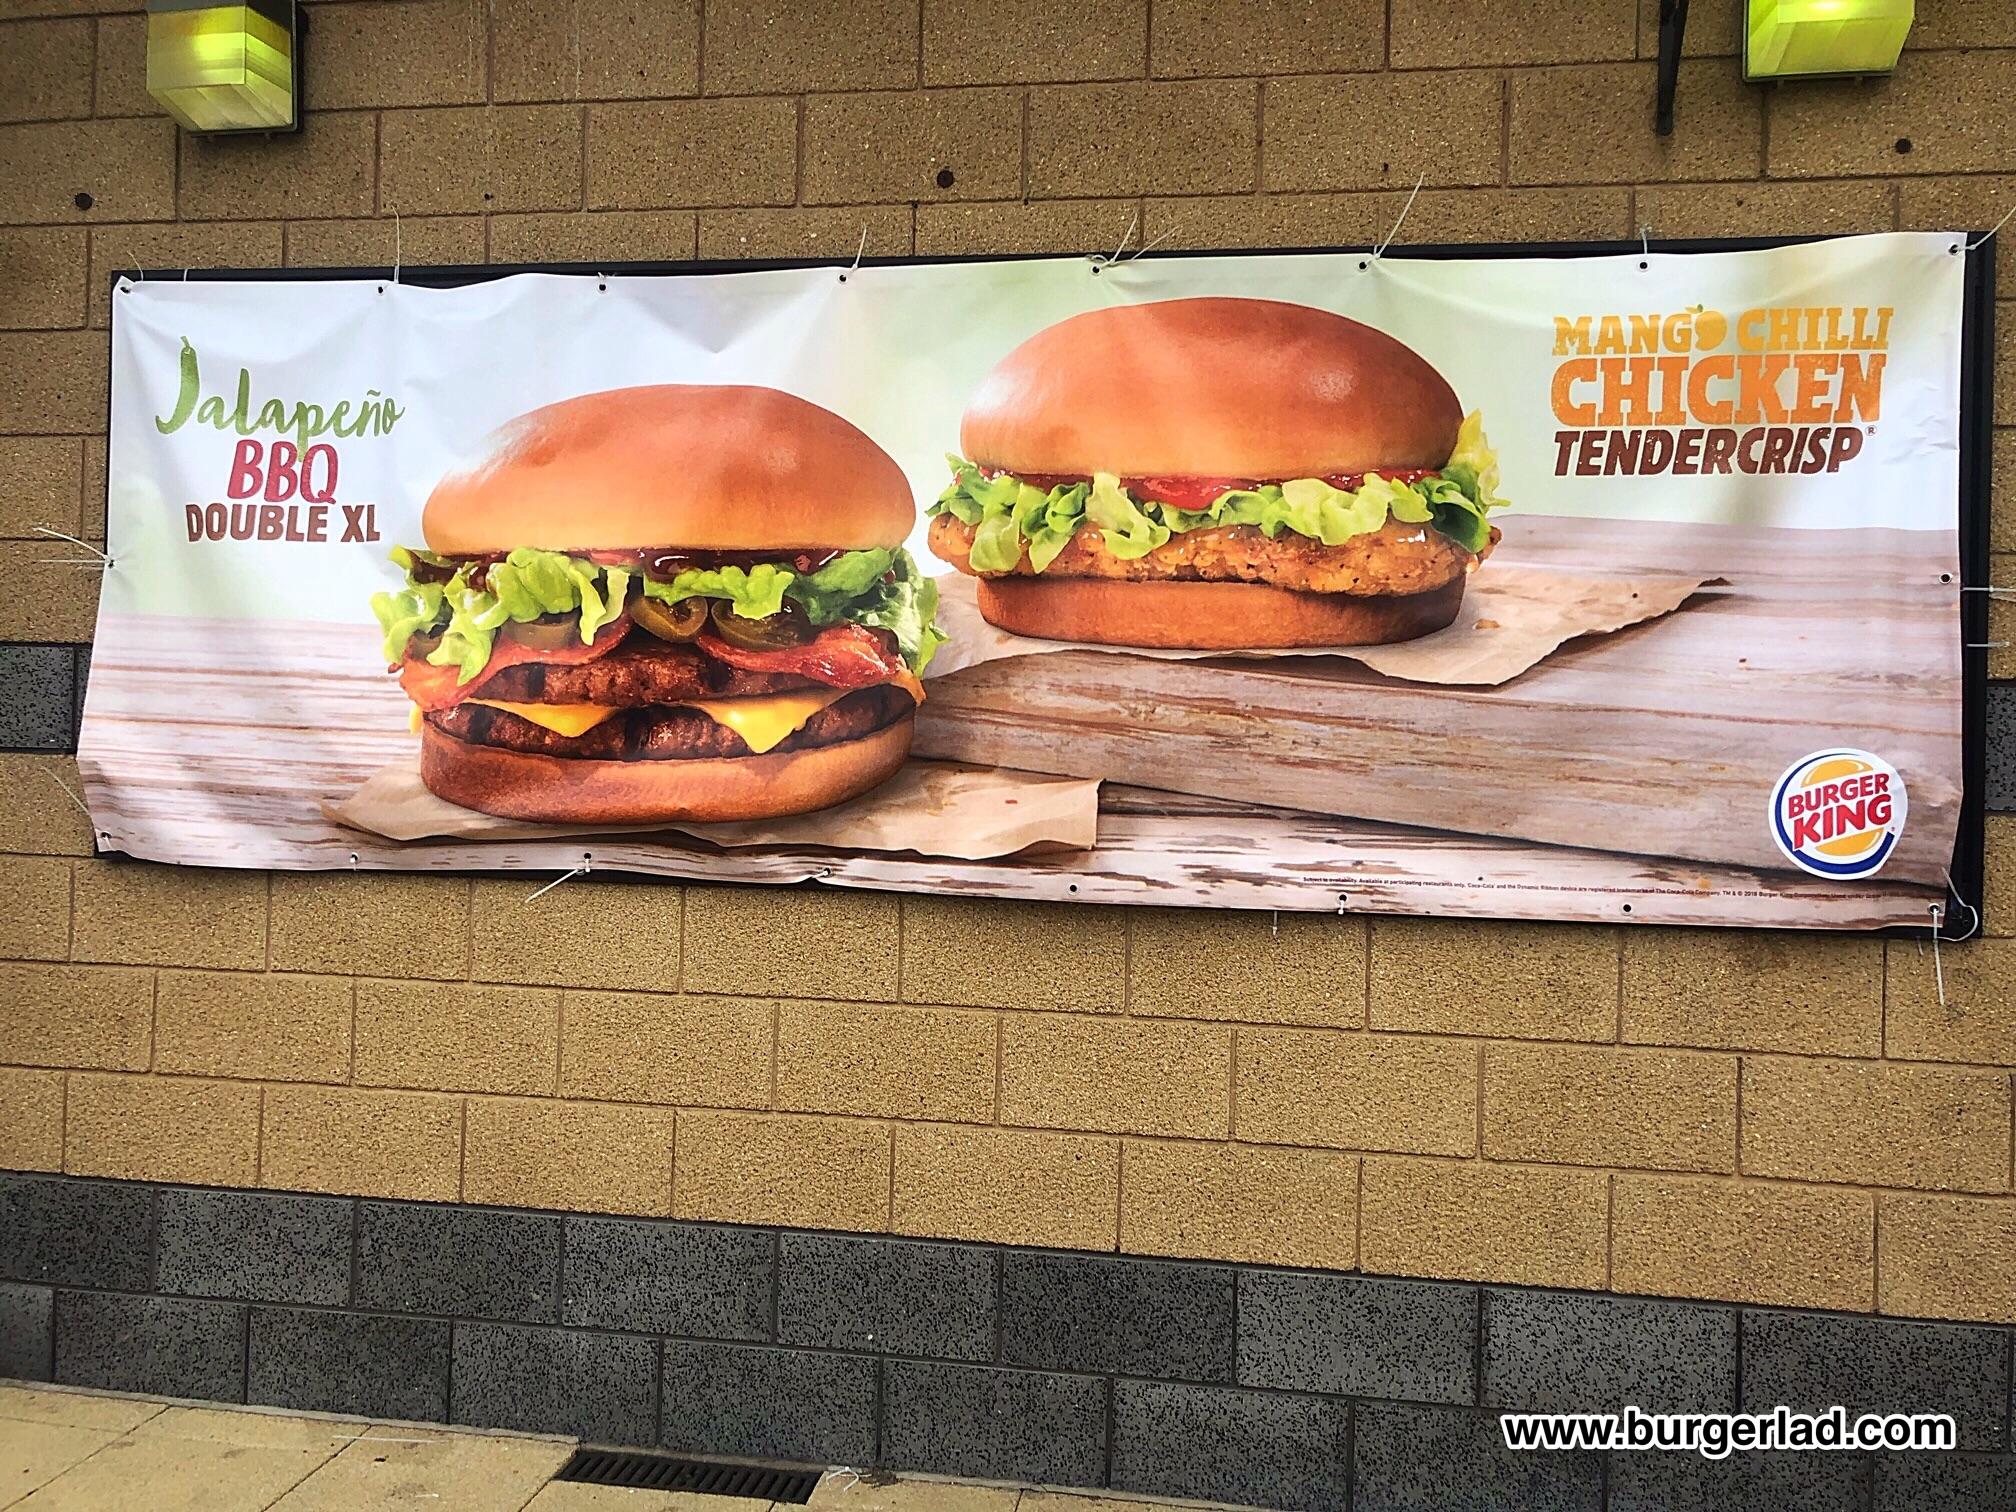 Burger King Mango Chilli Chicken Tendercrisp